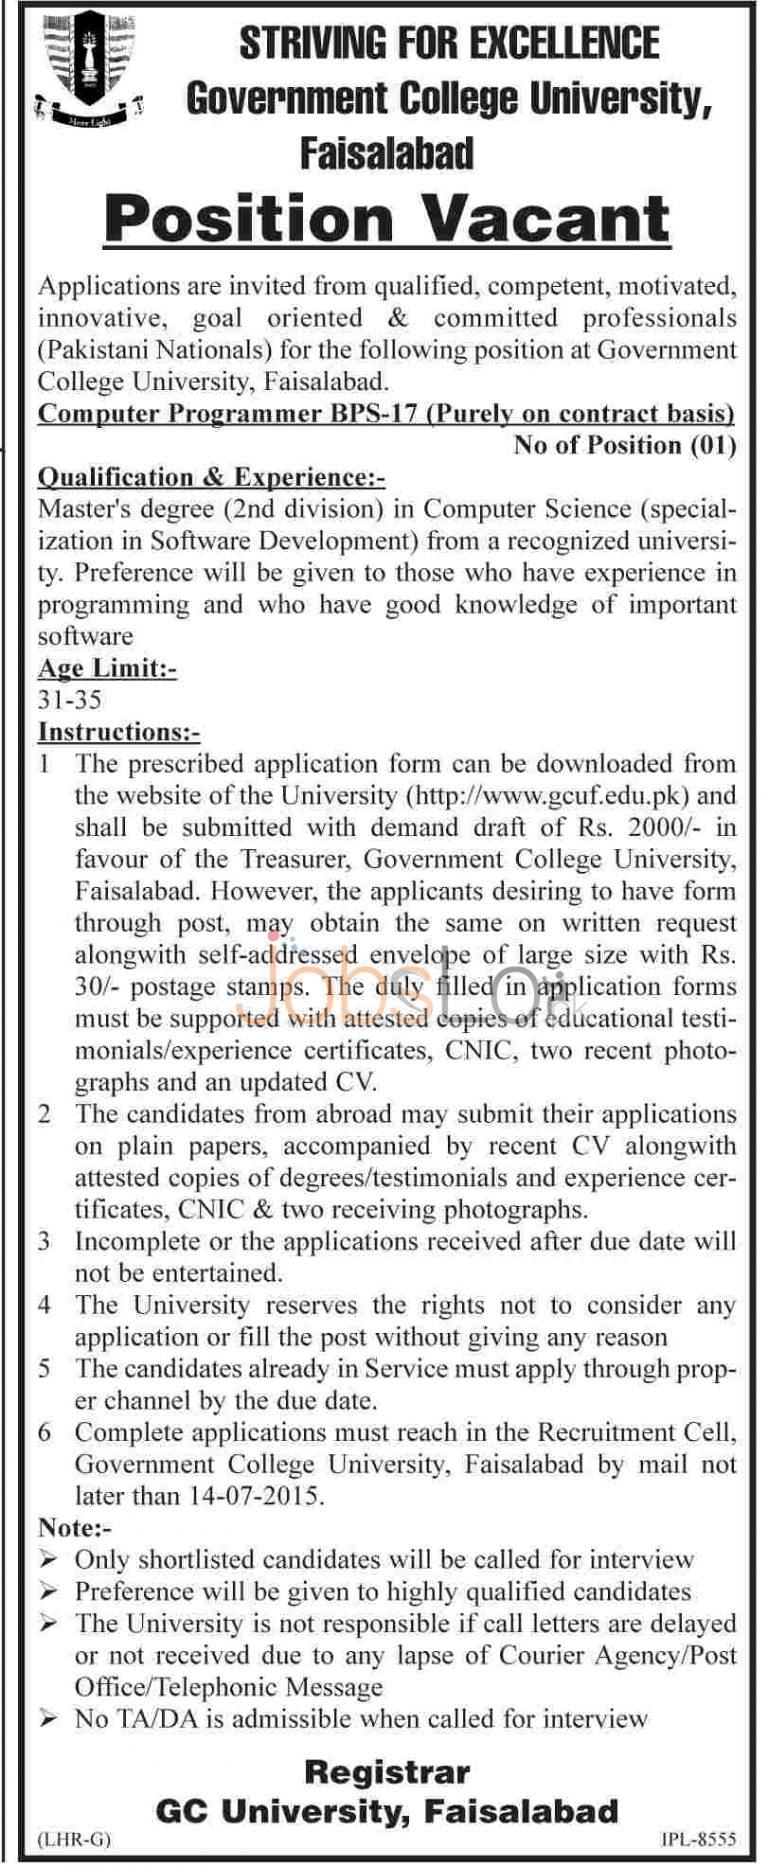 GC University Faisalabad Jobs July 2015 for Computer Programmer